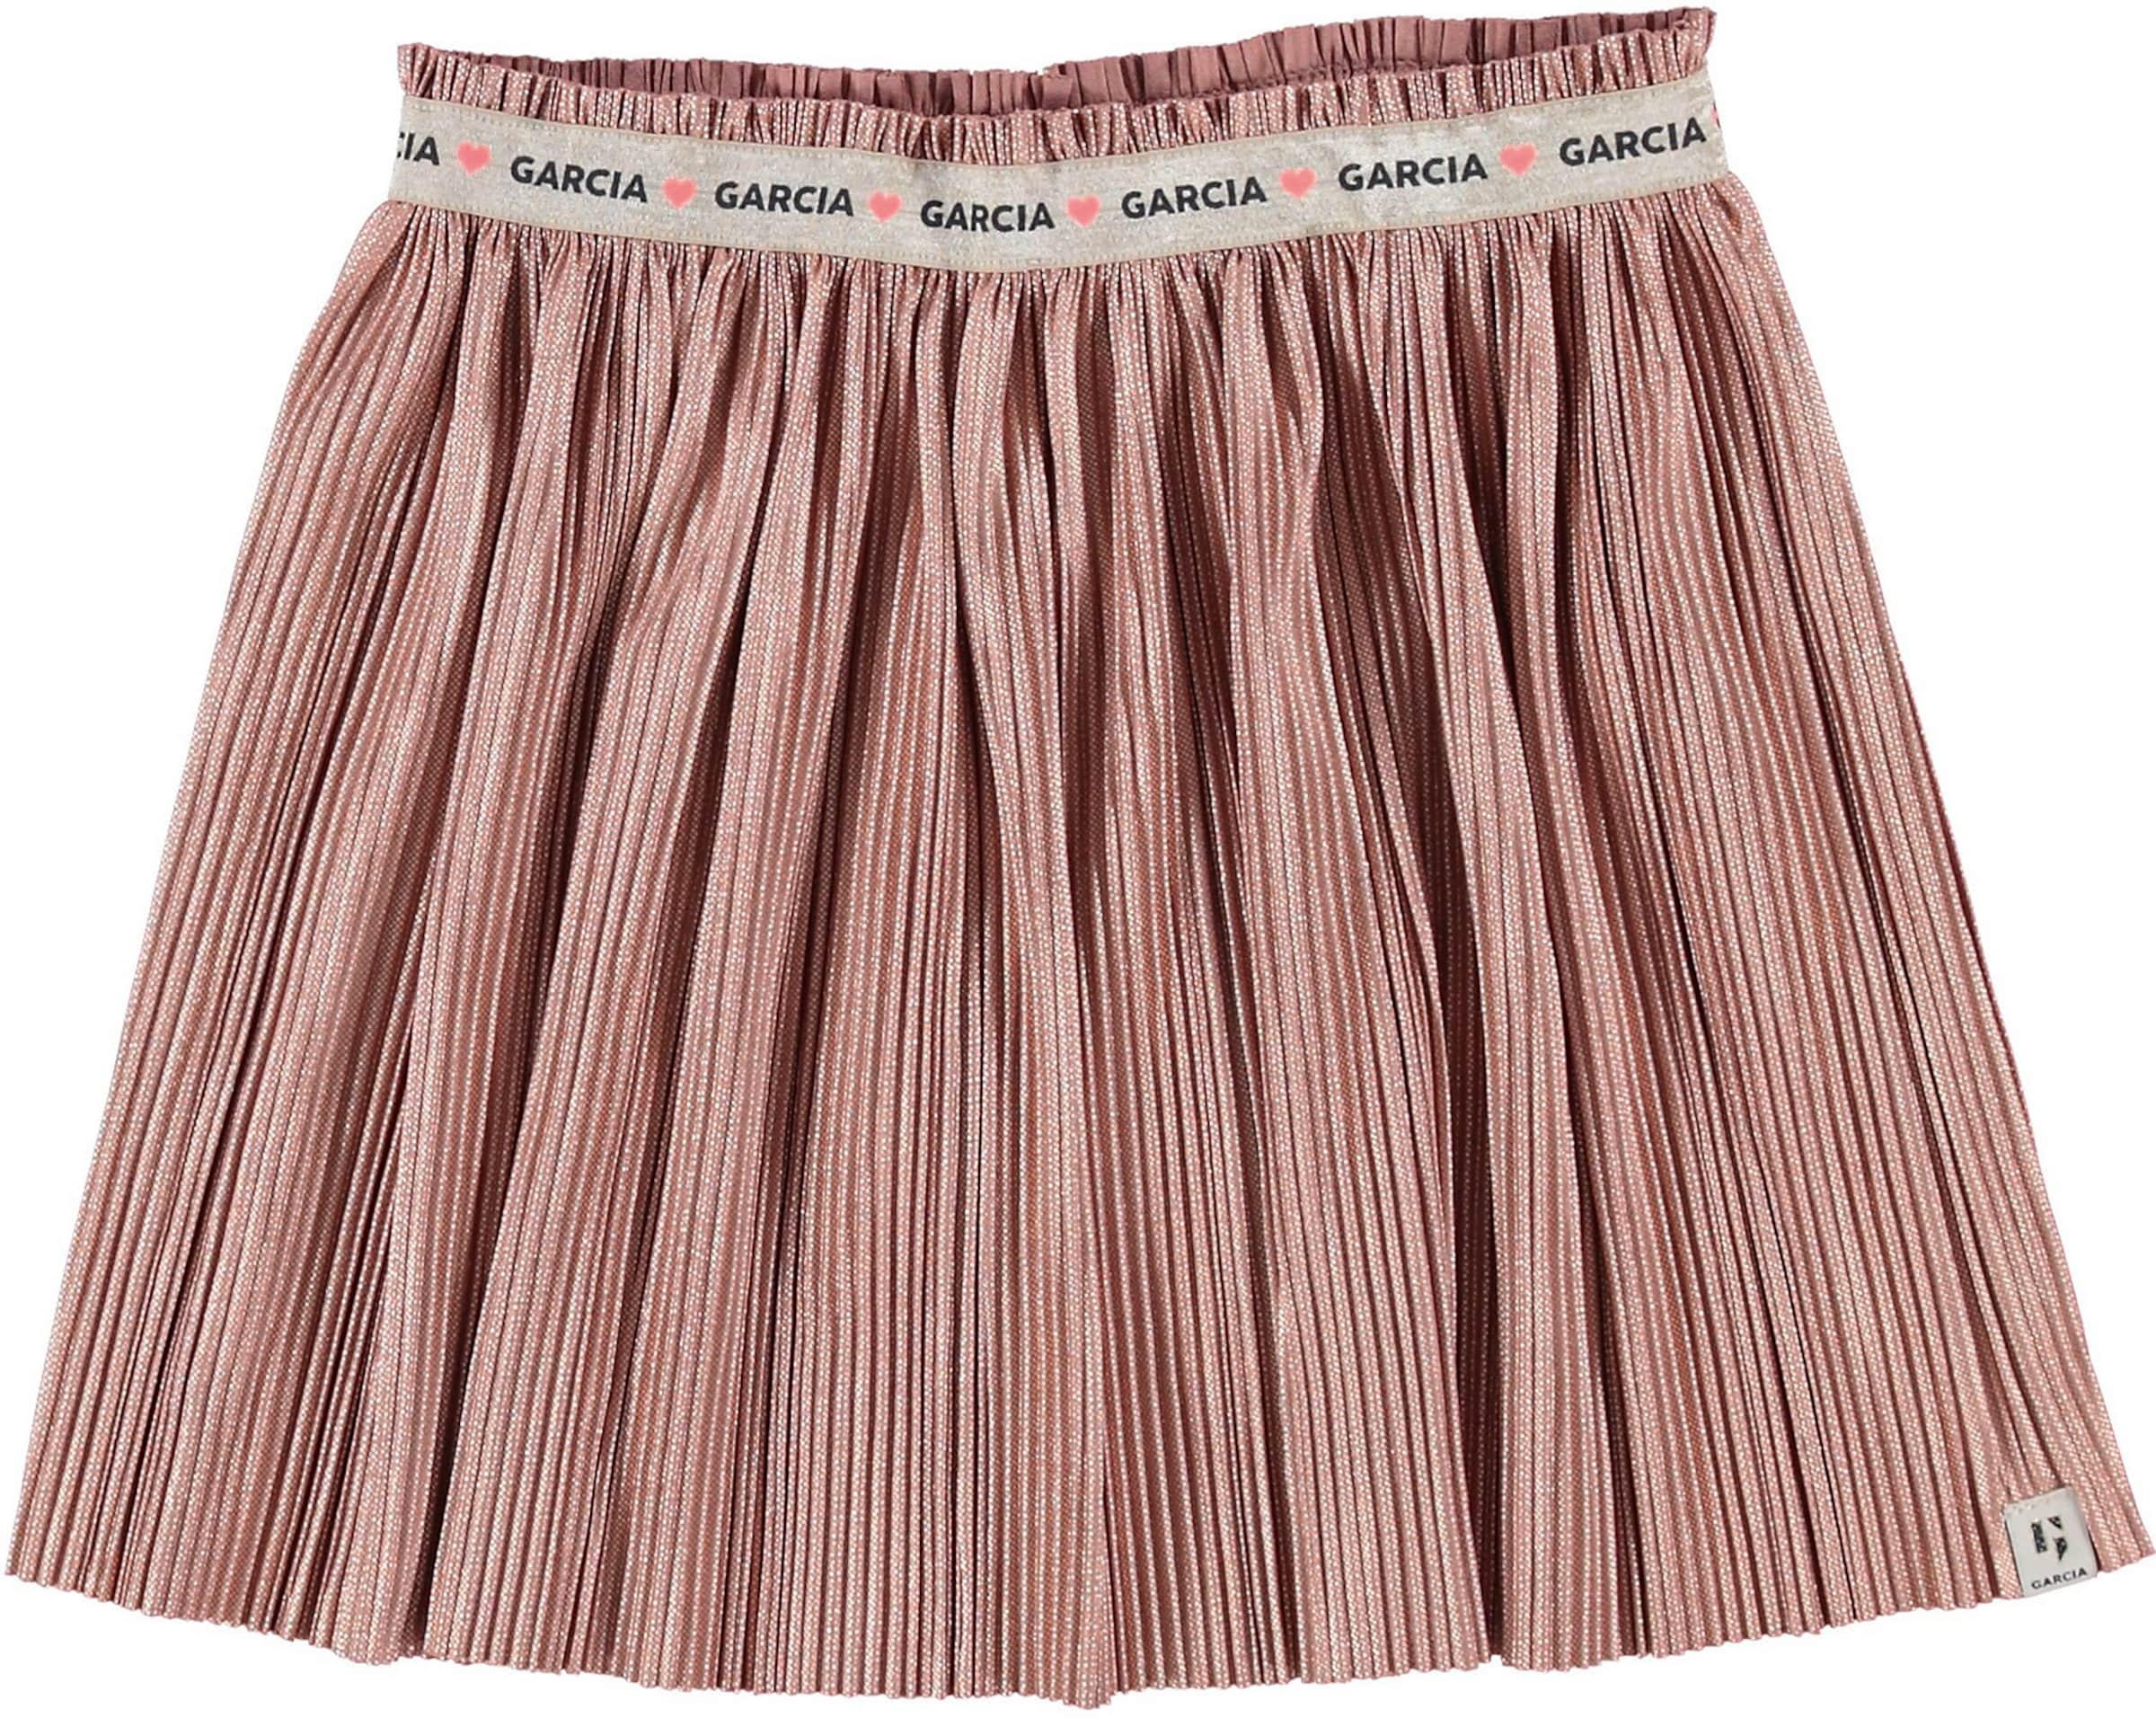 Kinder,  Mädchen,  Kinder GARCIA Rock beige, pink,  rosa,  schwarz | 08718212833089